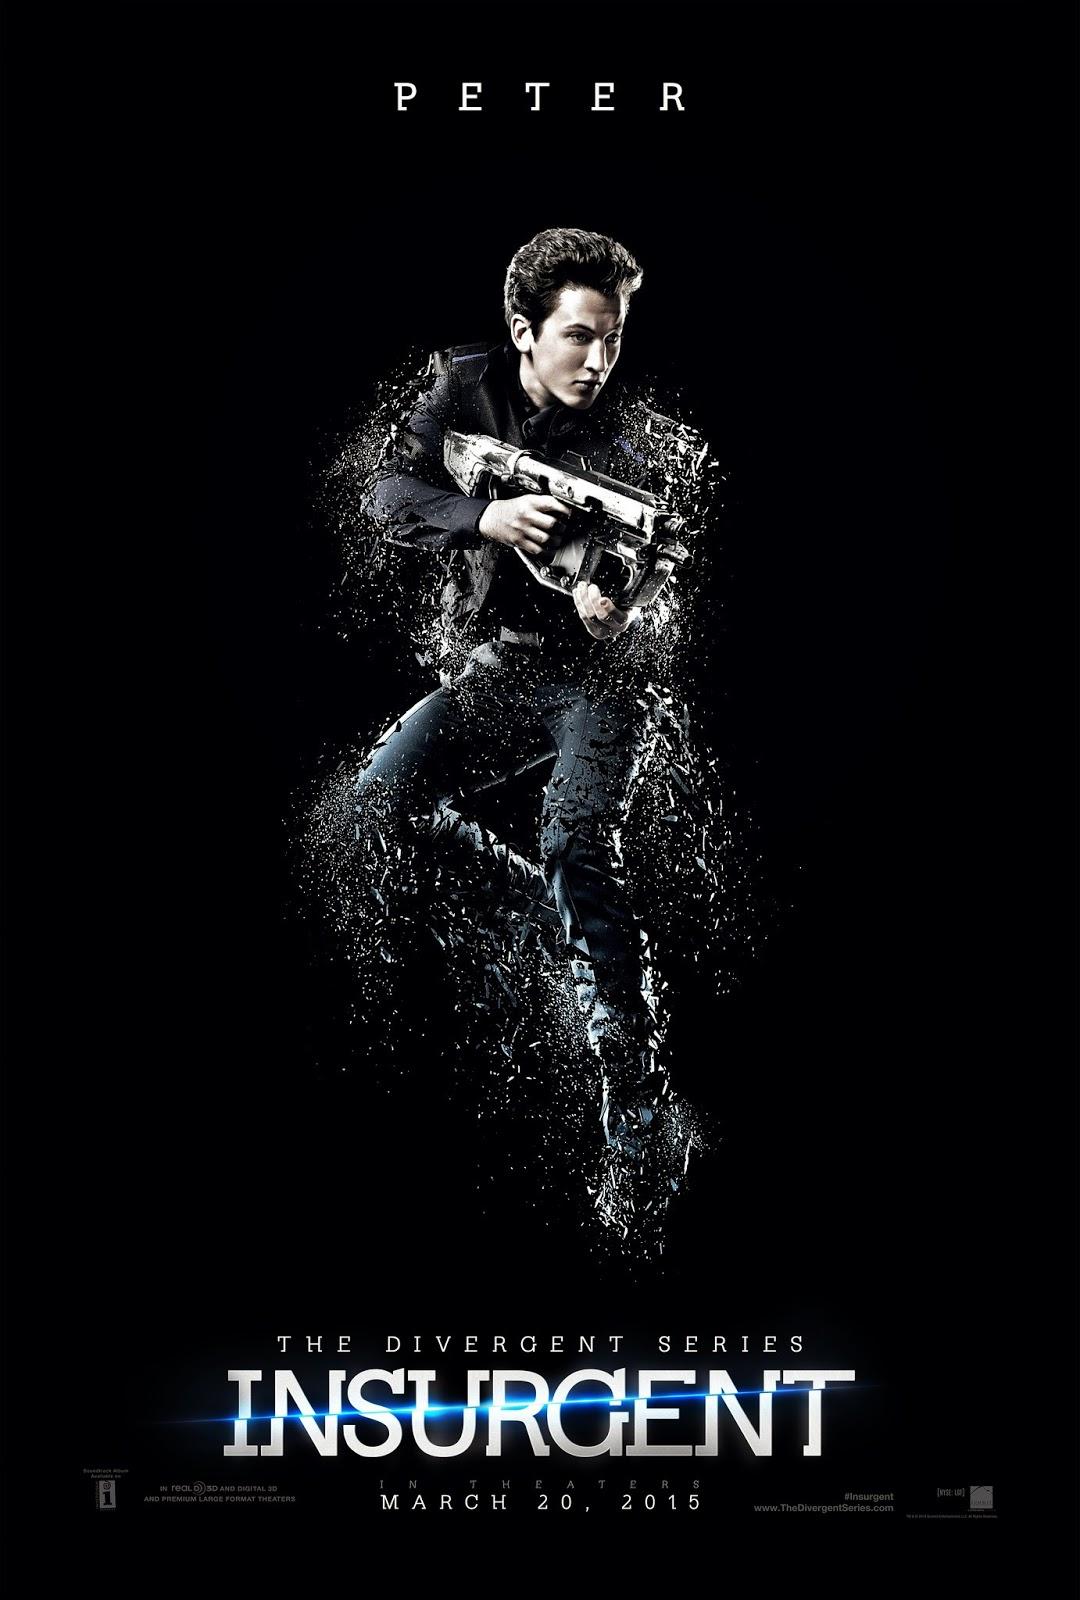 Peter Insurgent